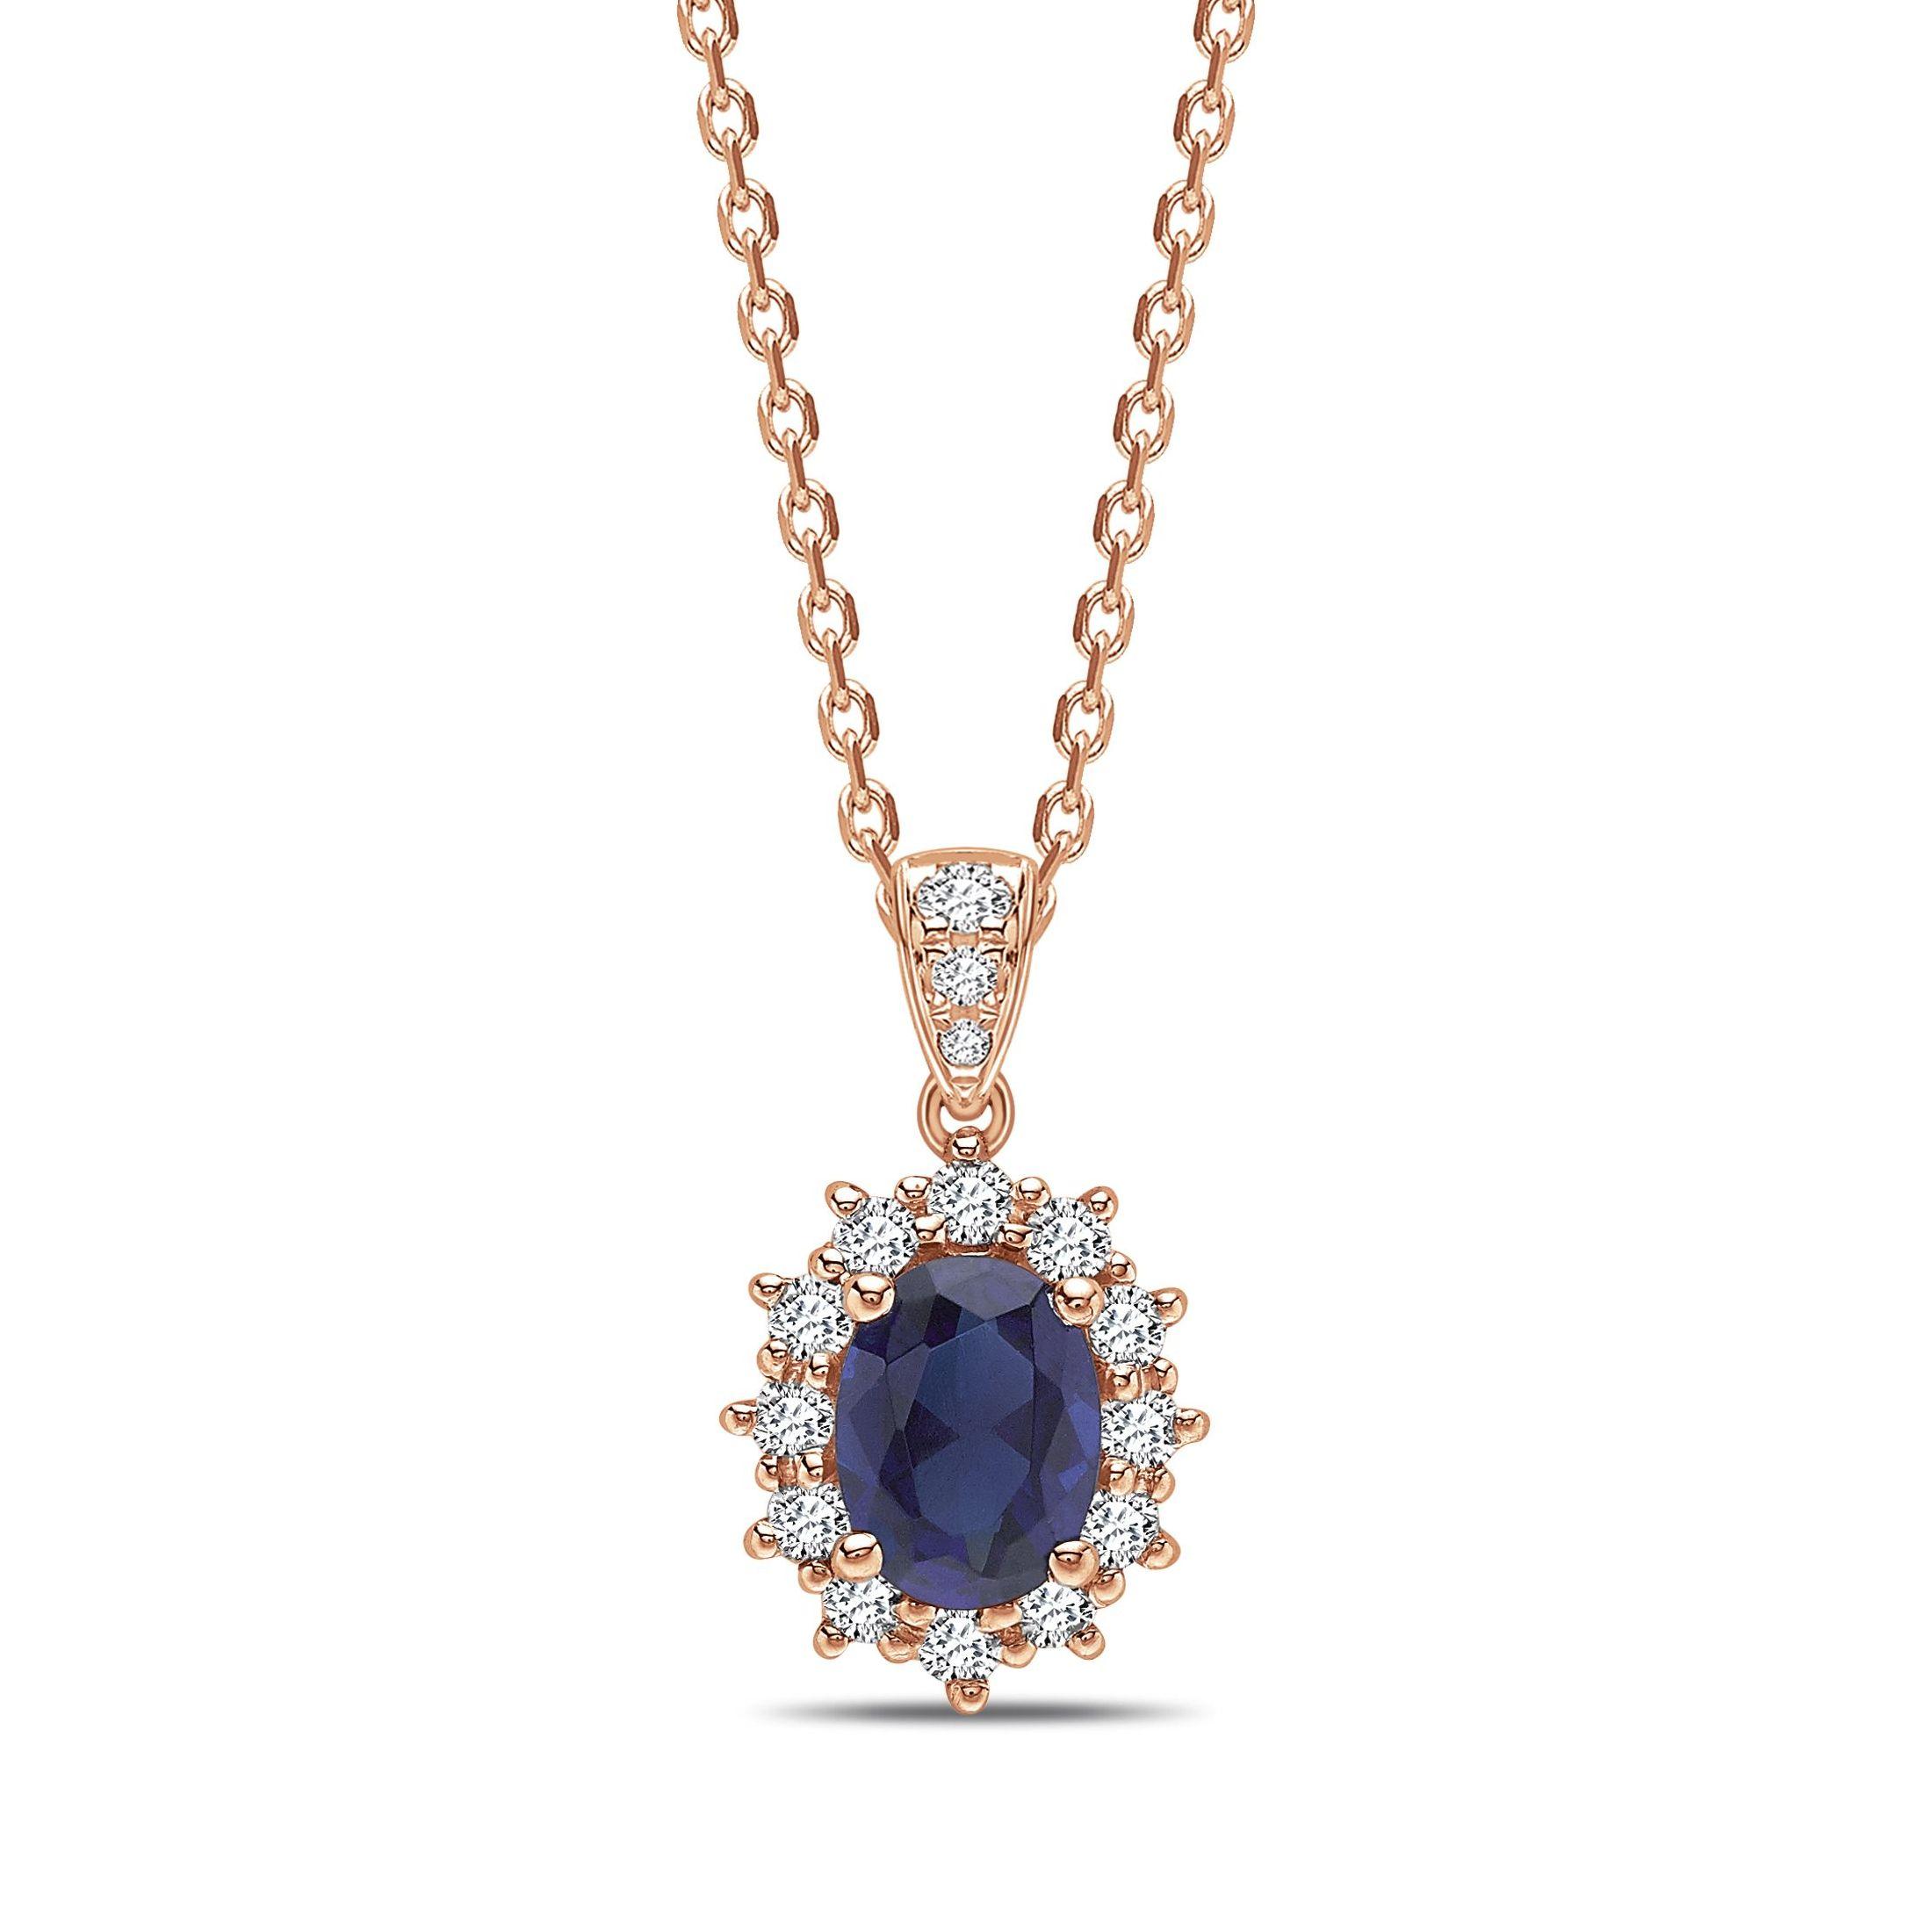 Star Halo Dangling Oval Shape Halo Diamond Pendant Necklace